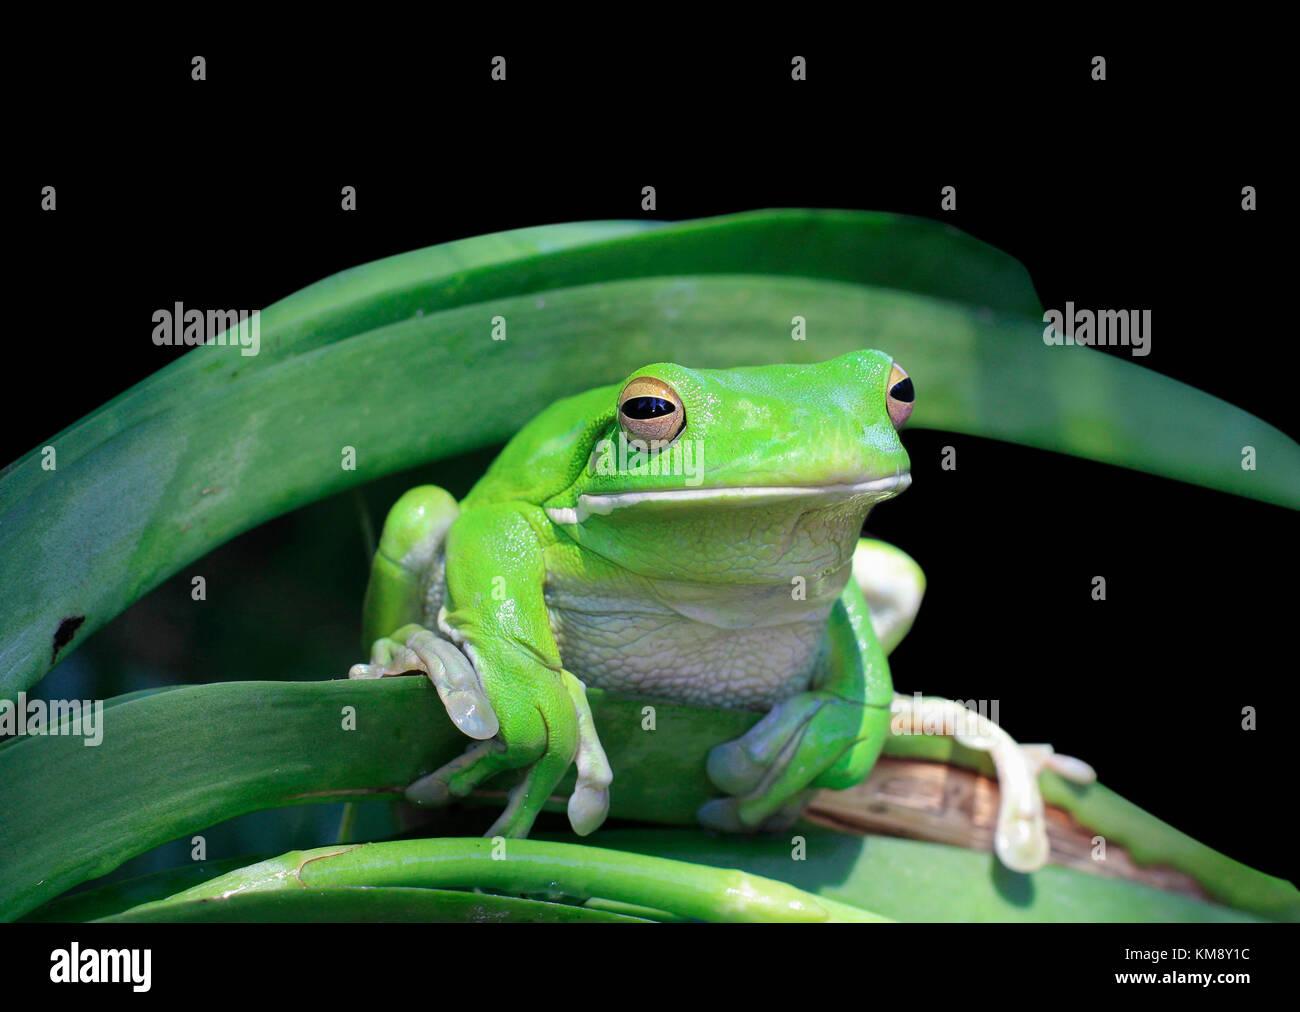 Cerca de una rana verde tropical Imagen De Stock